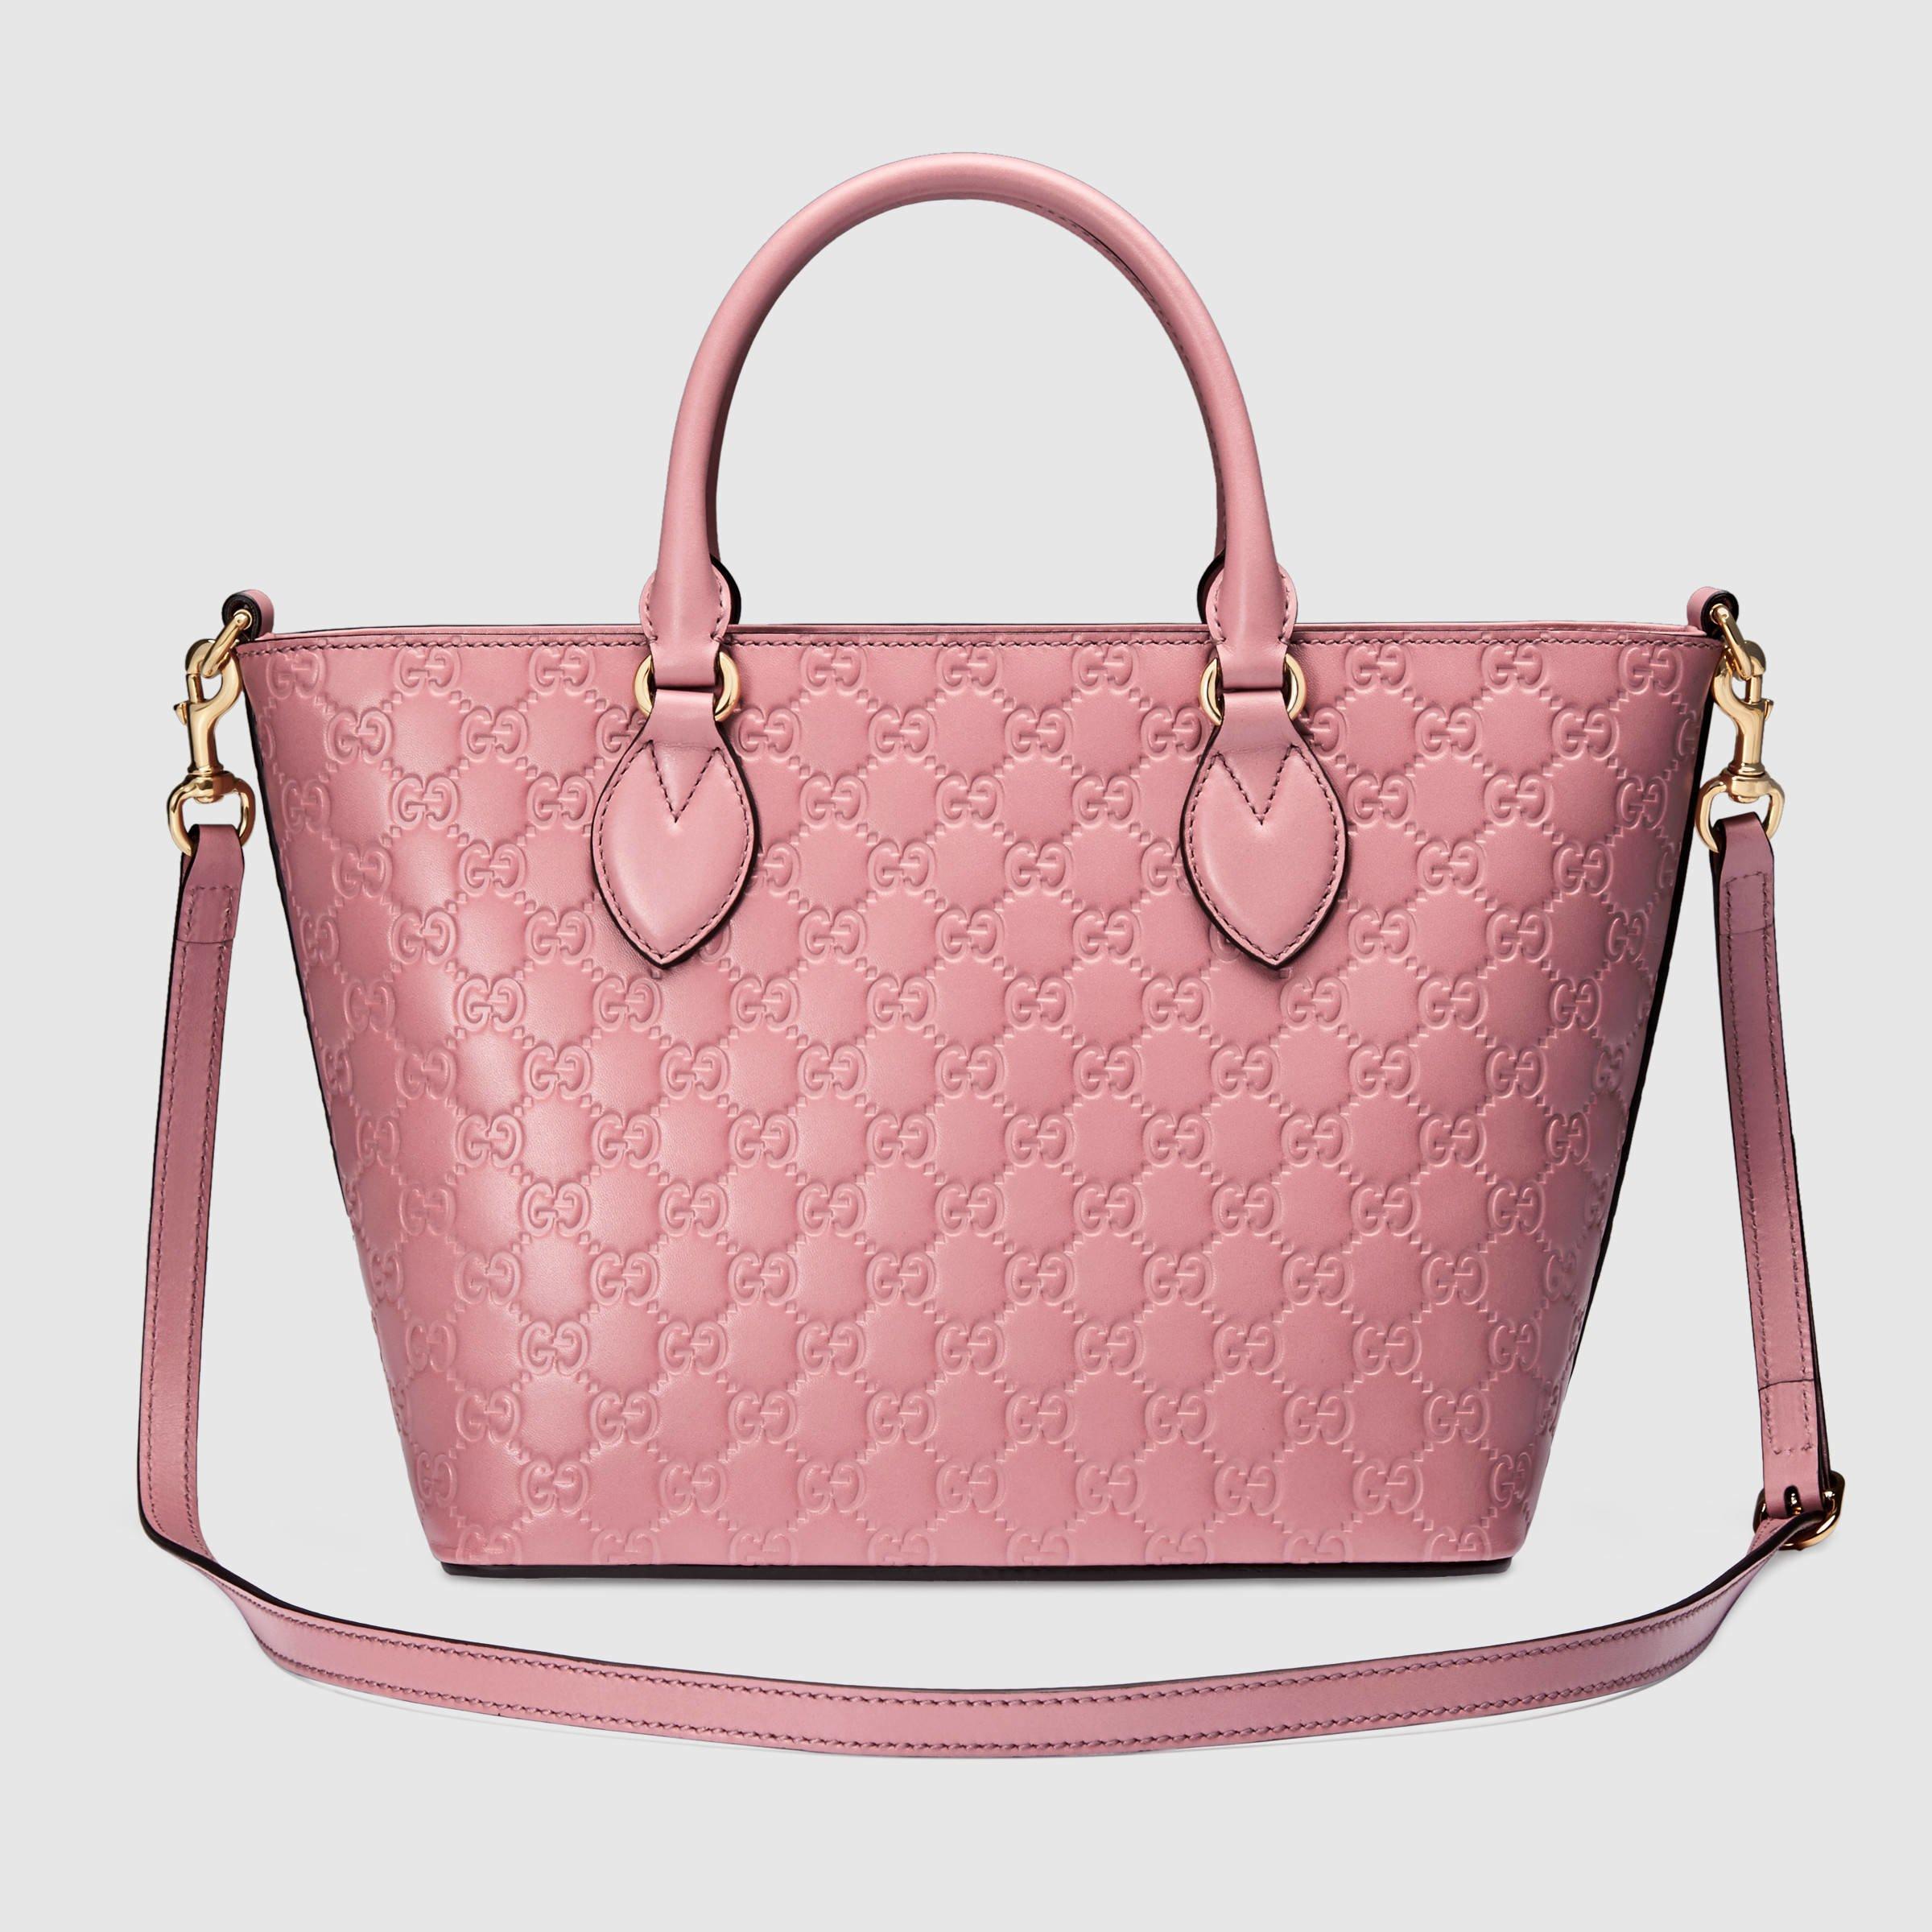 dc2c71f2ffb341 Gucci Leather Totes. Gucci Totes/Briefcases Gucci Black Leather Tote  Shoulder ...